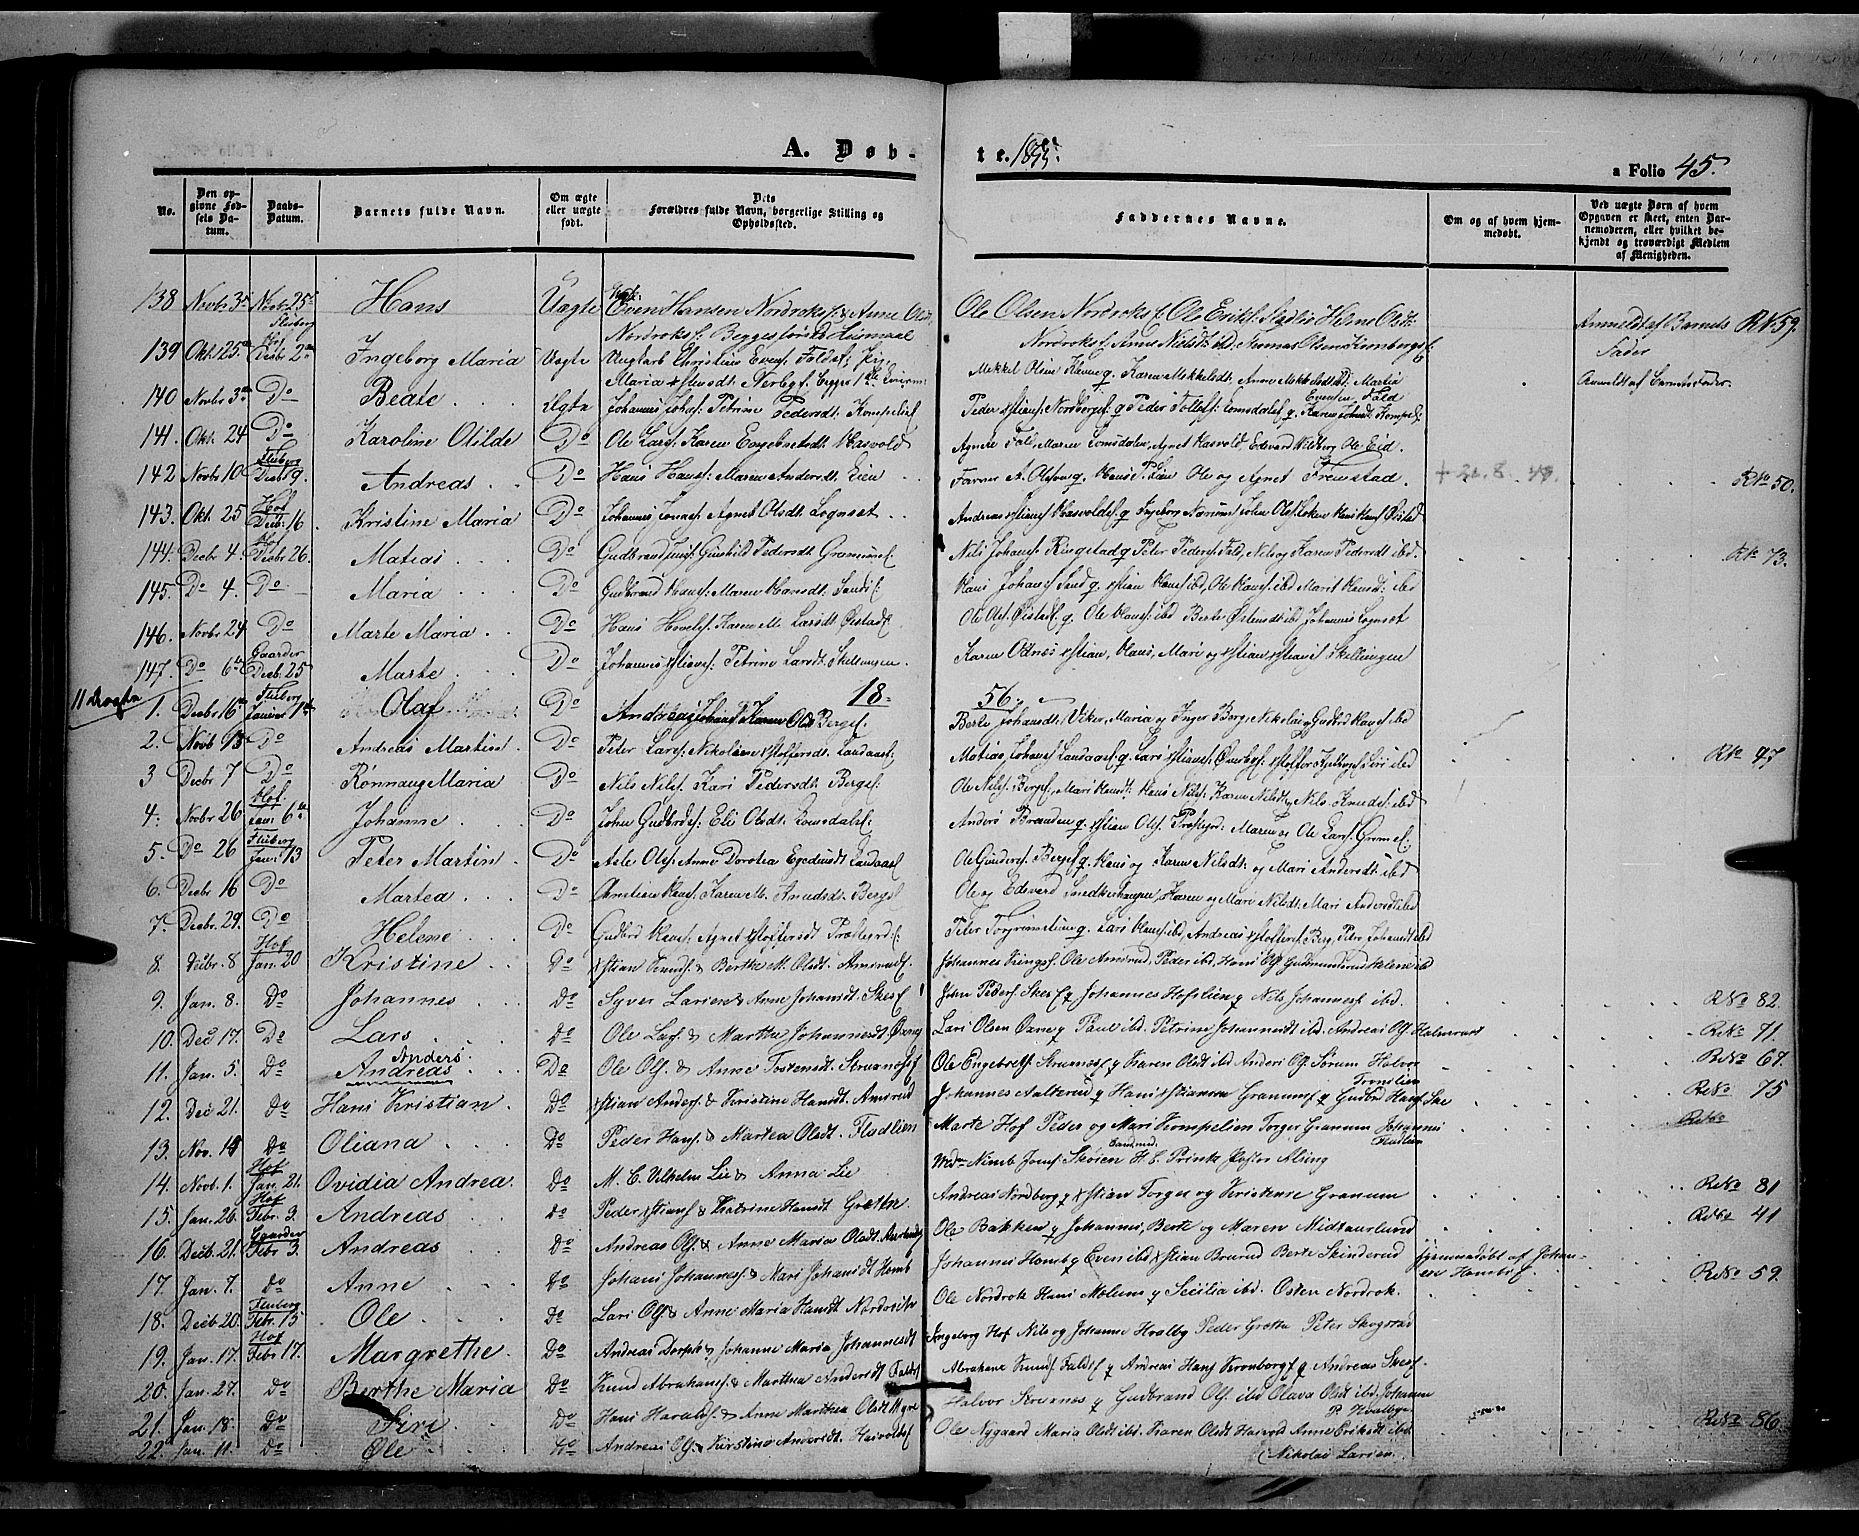 SAH, Land prestekontor, Ministerialbok nr. 9, 1847-1859, s. 45